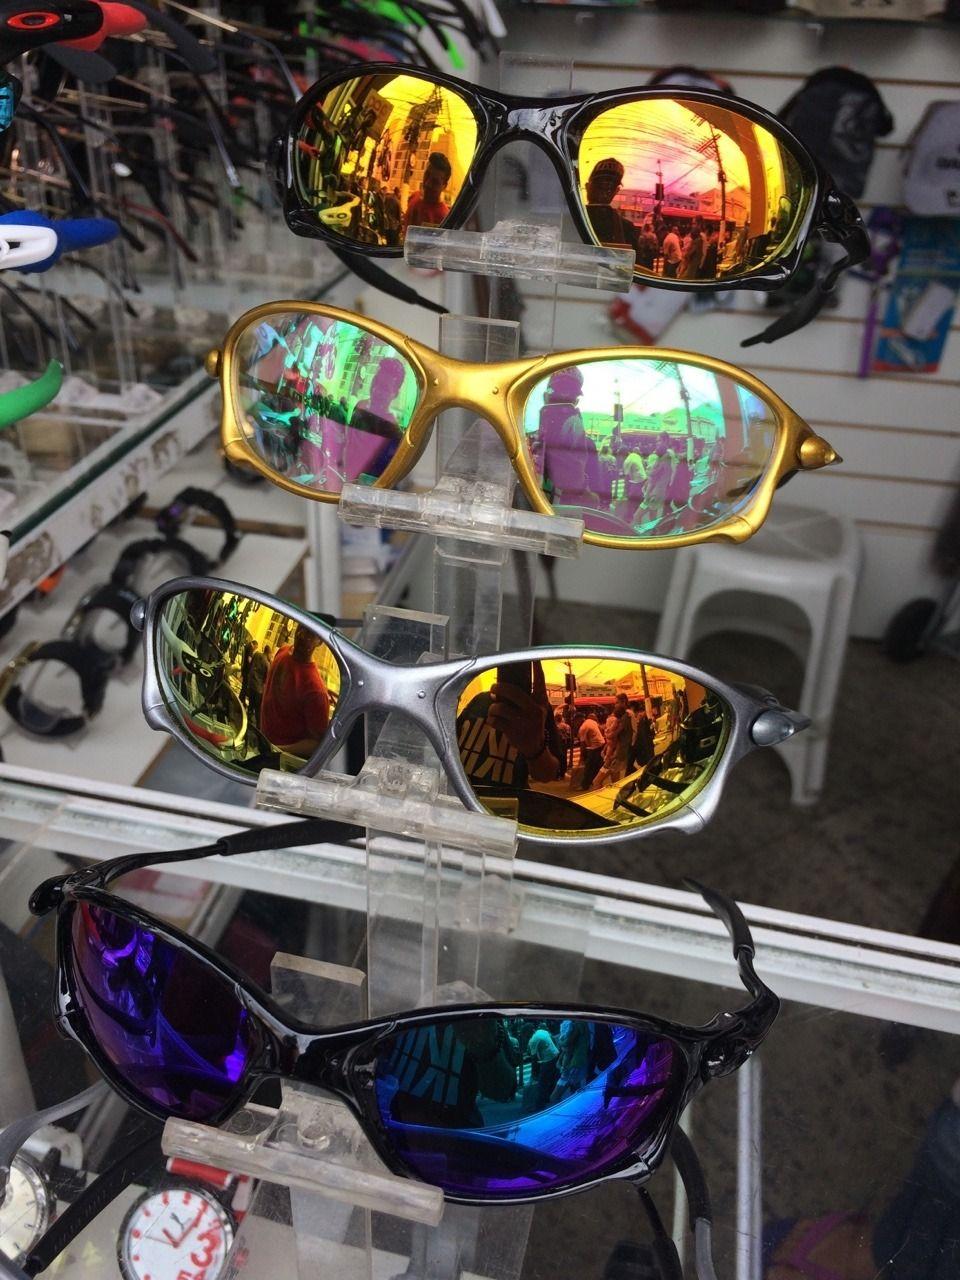 703895ce7 Oculos Juliet, Roupas Futuras, Acessórios Femininos, Inveja, Chapada,  Sapatos, Oakley